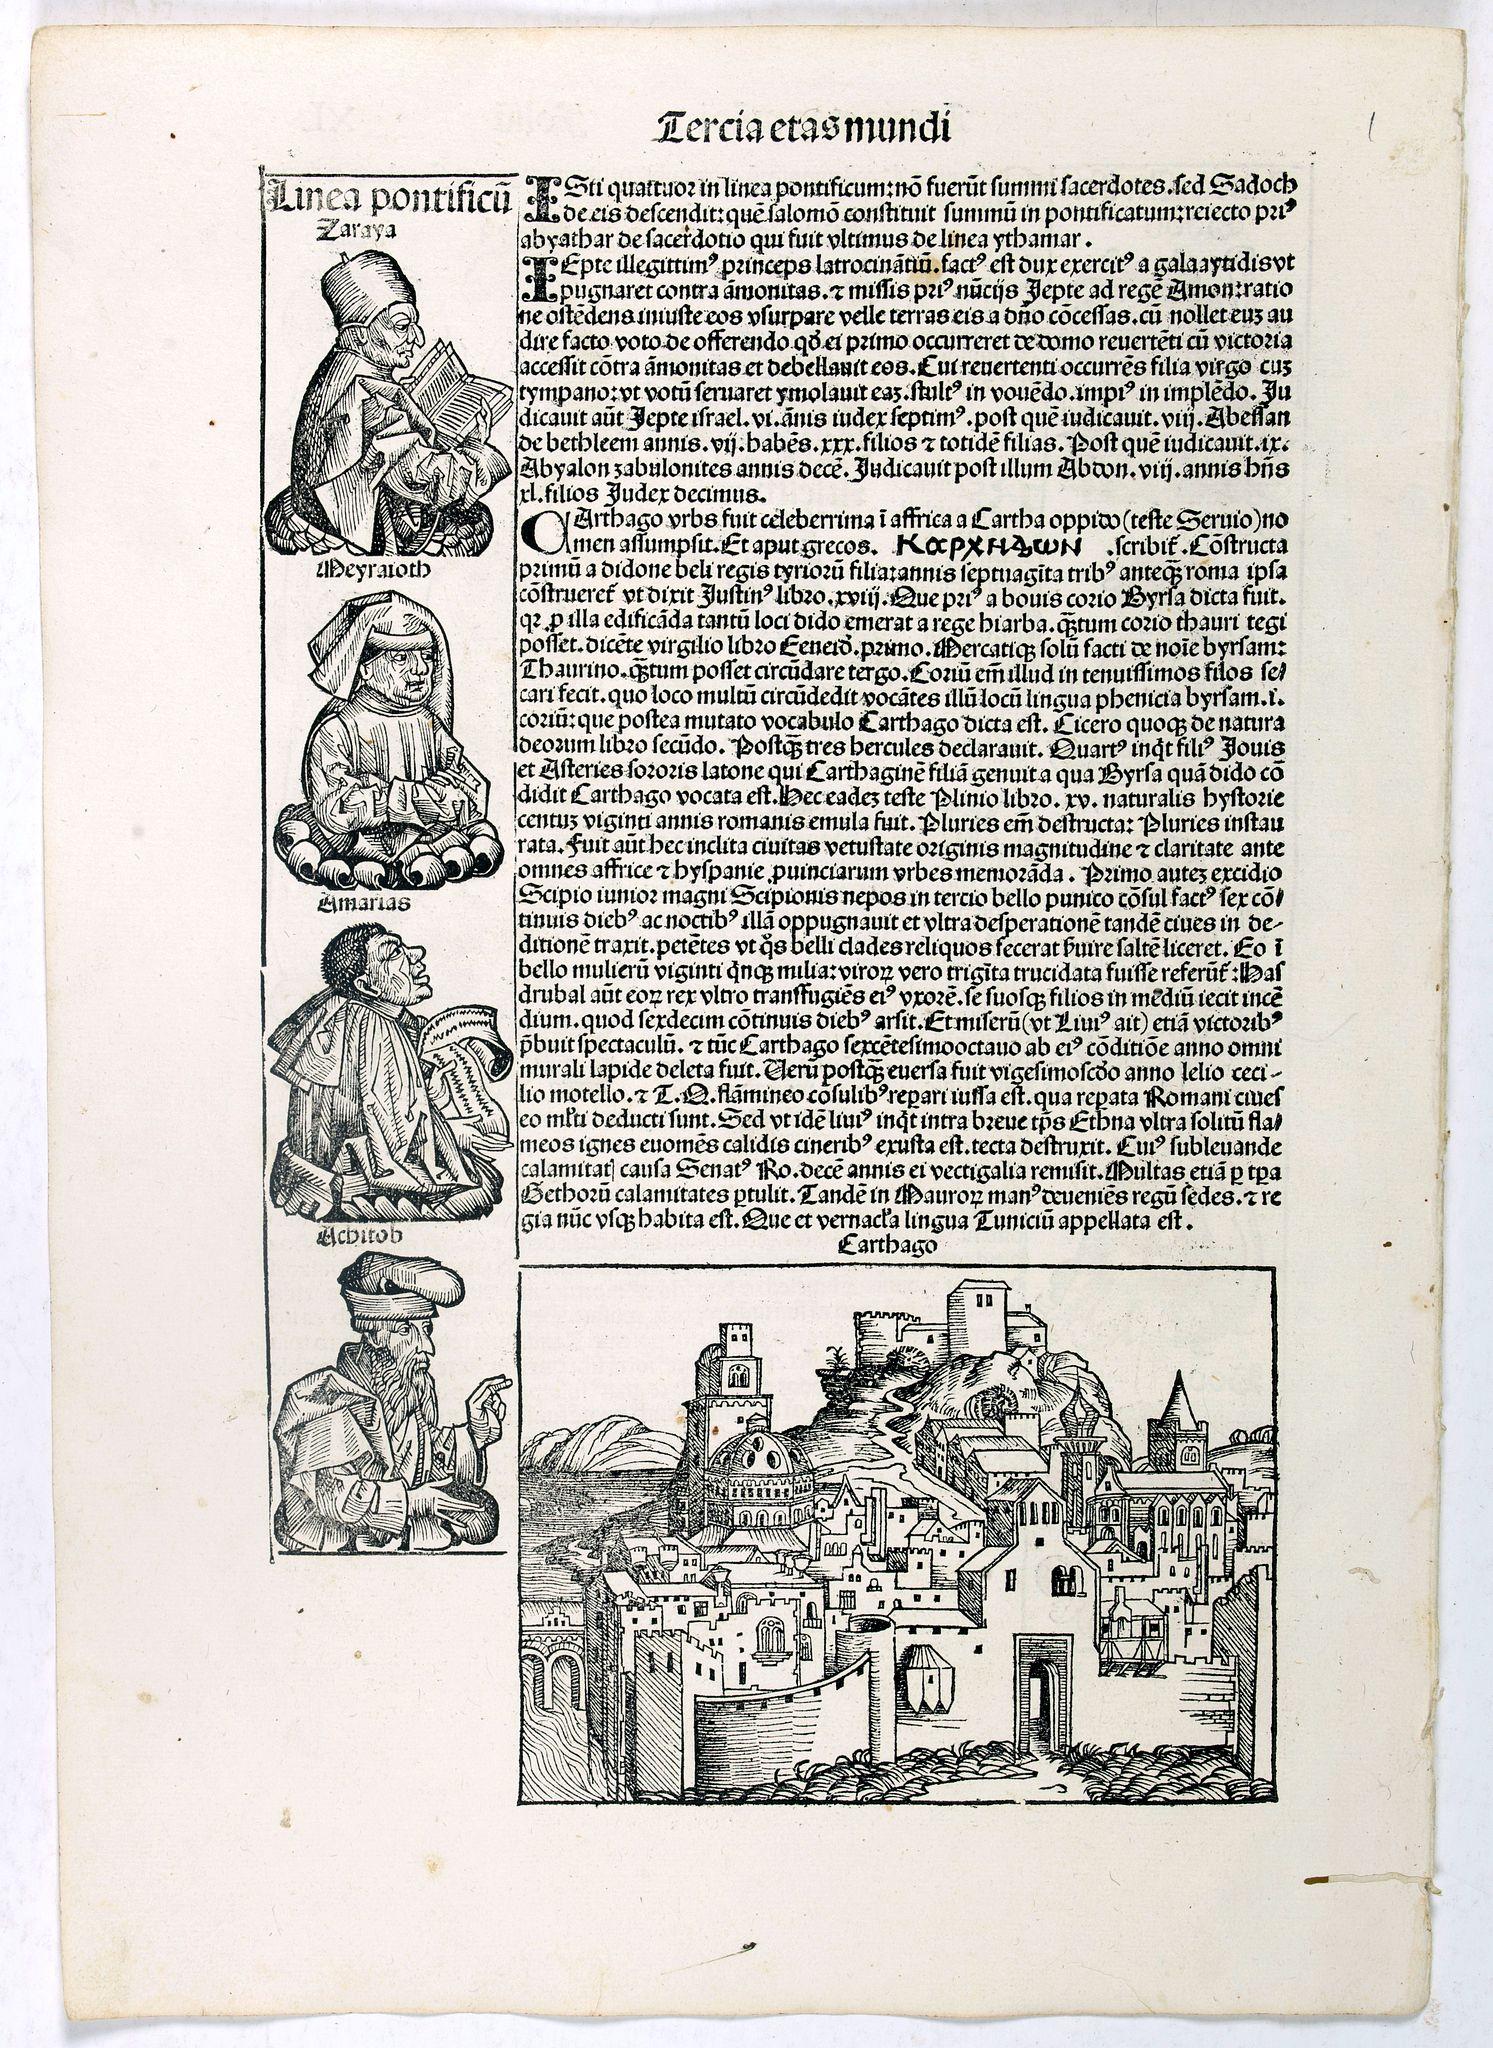 SCHEDEL, H. -  Tercia Etas Mundi. / Carthago (Carthage in Tunisia). / Folio XL.